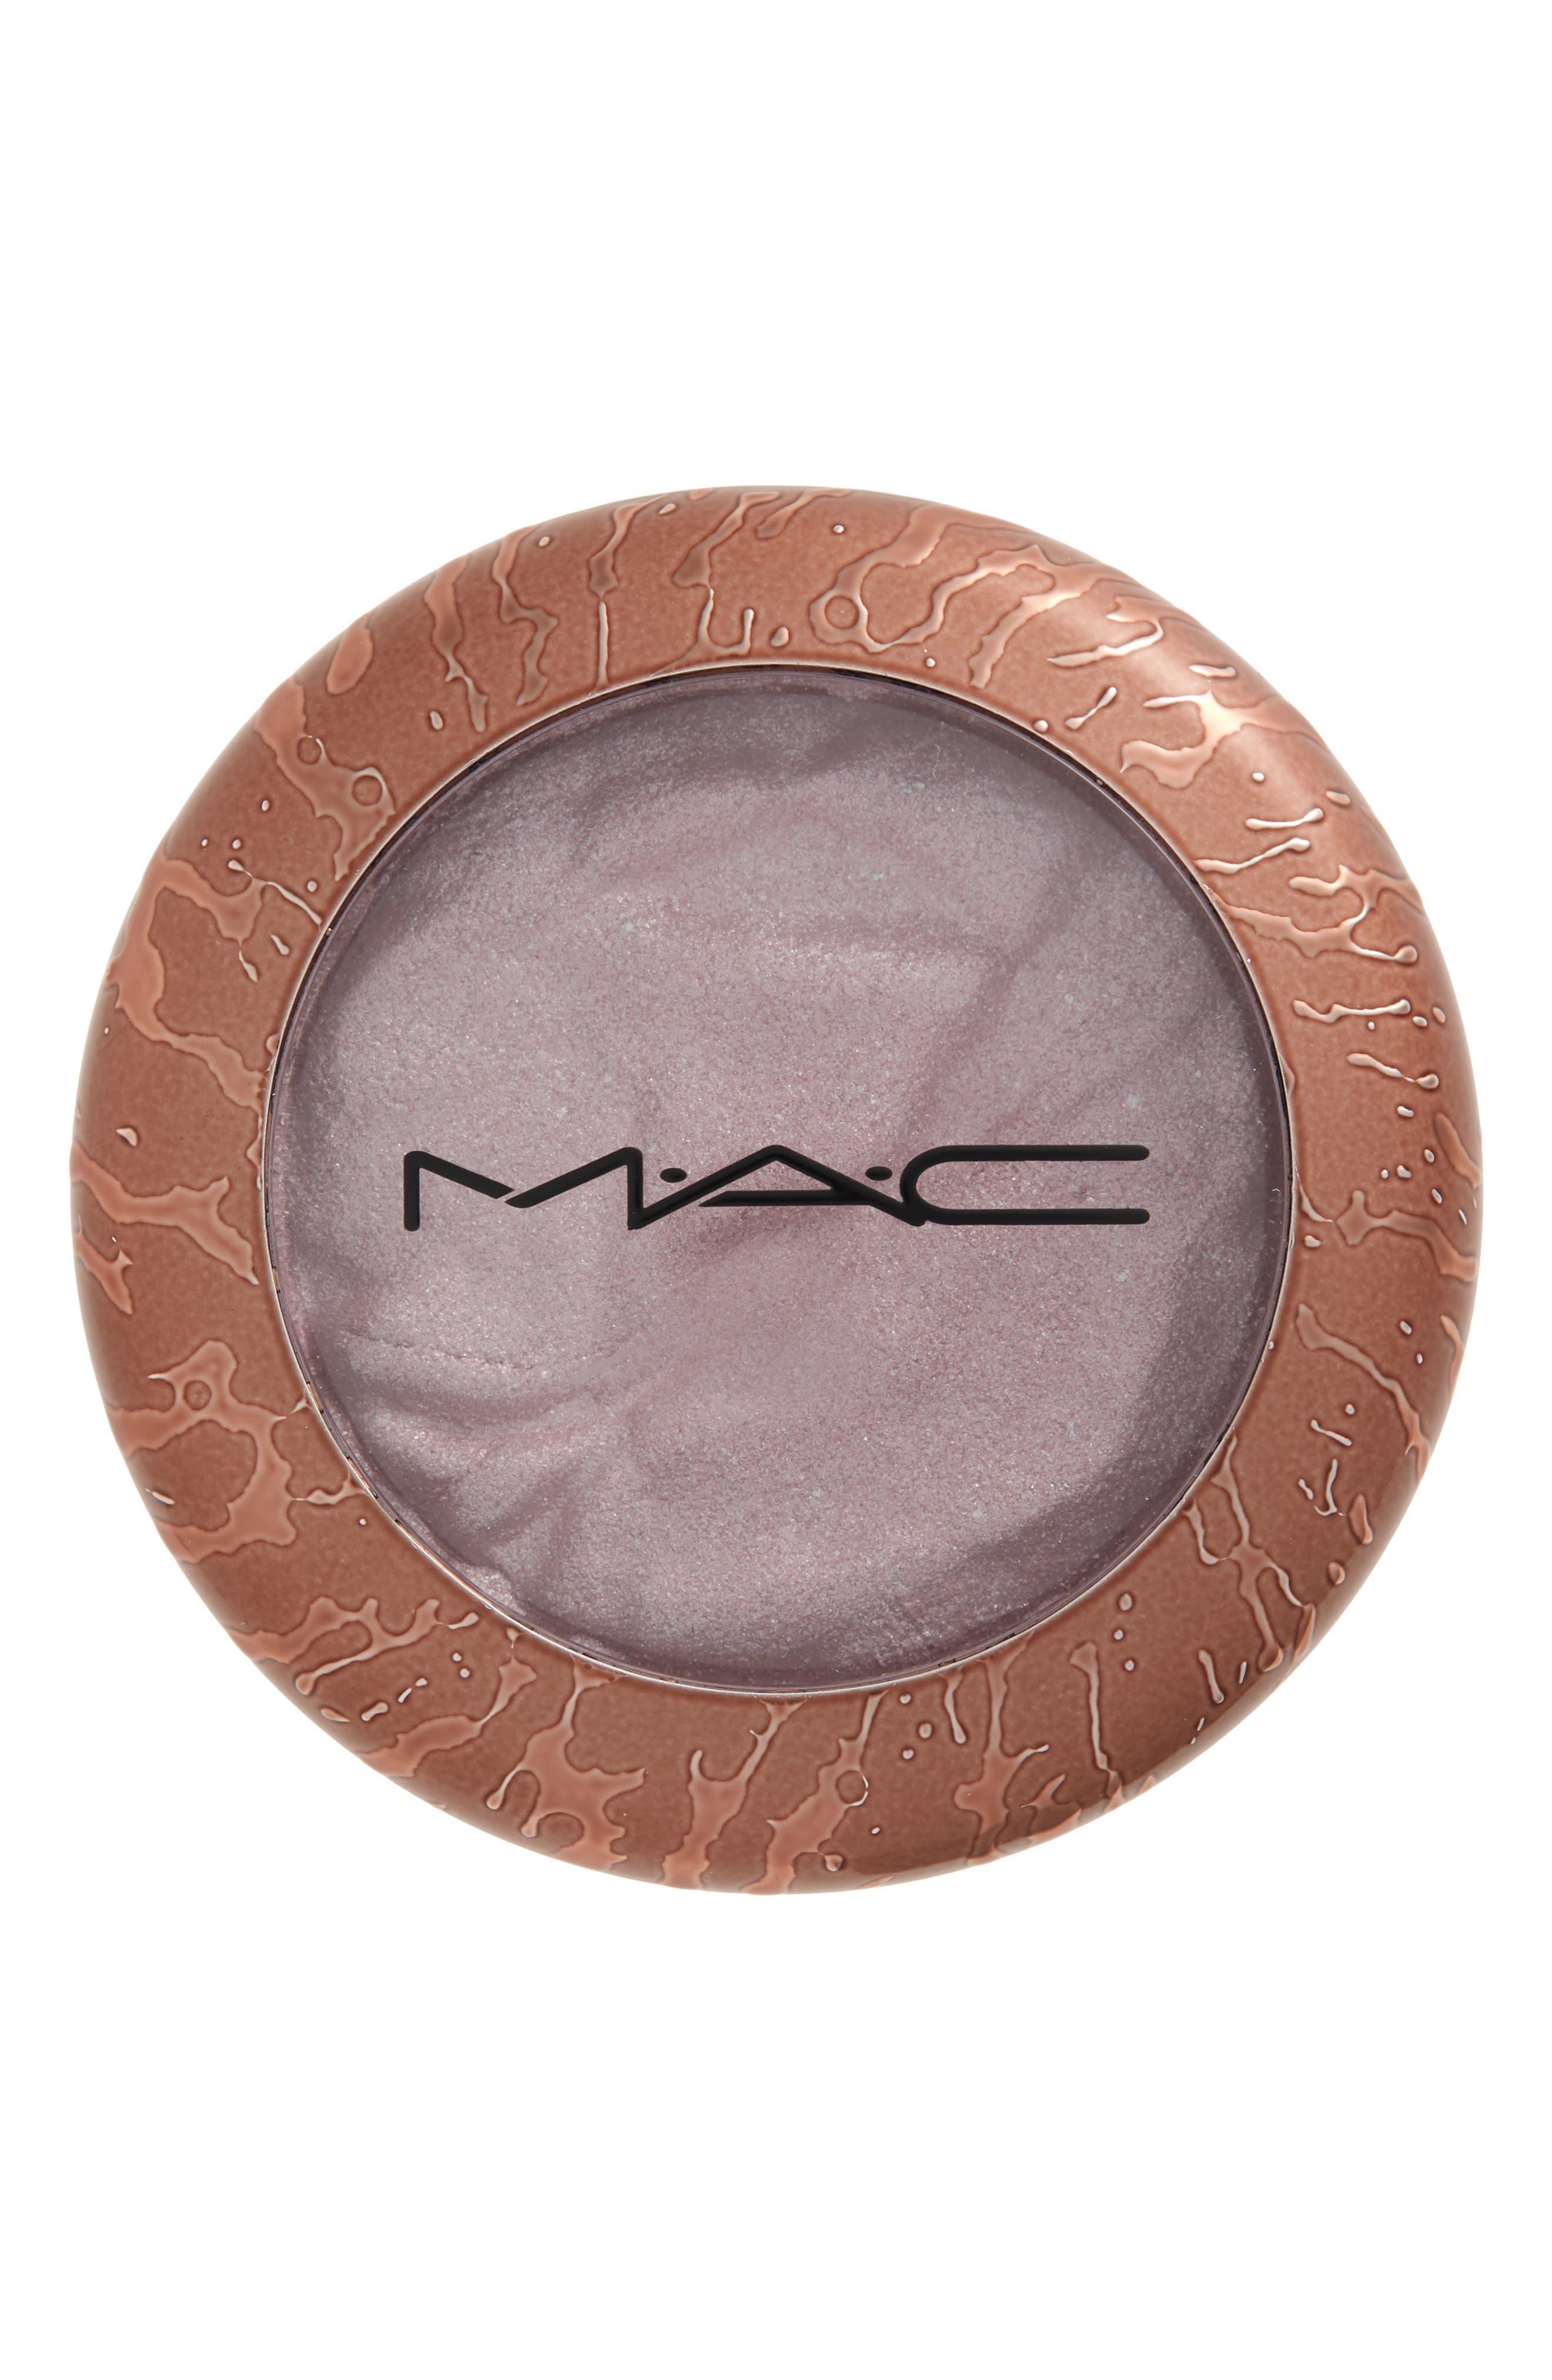 Image of MAC Cosmetics Bronzing 2020 Foiled Shadow